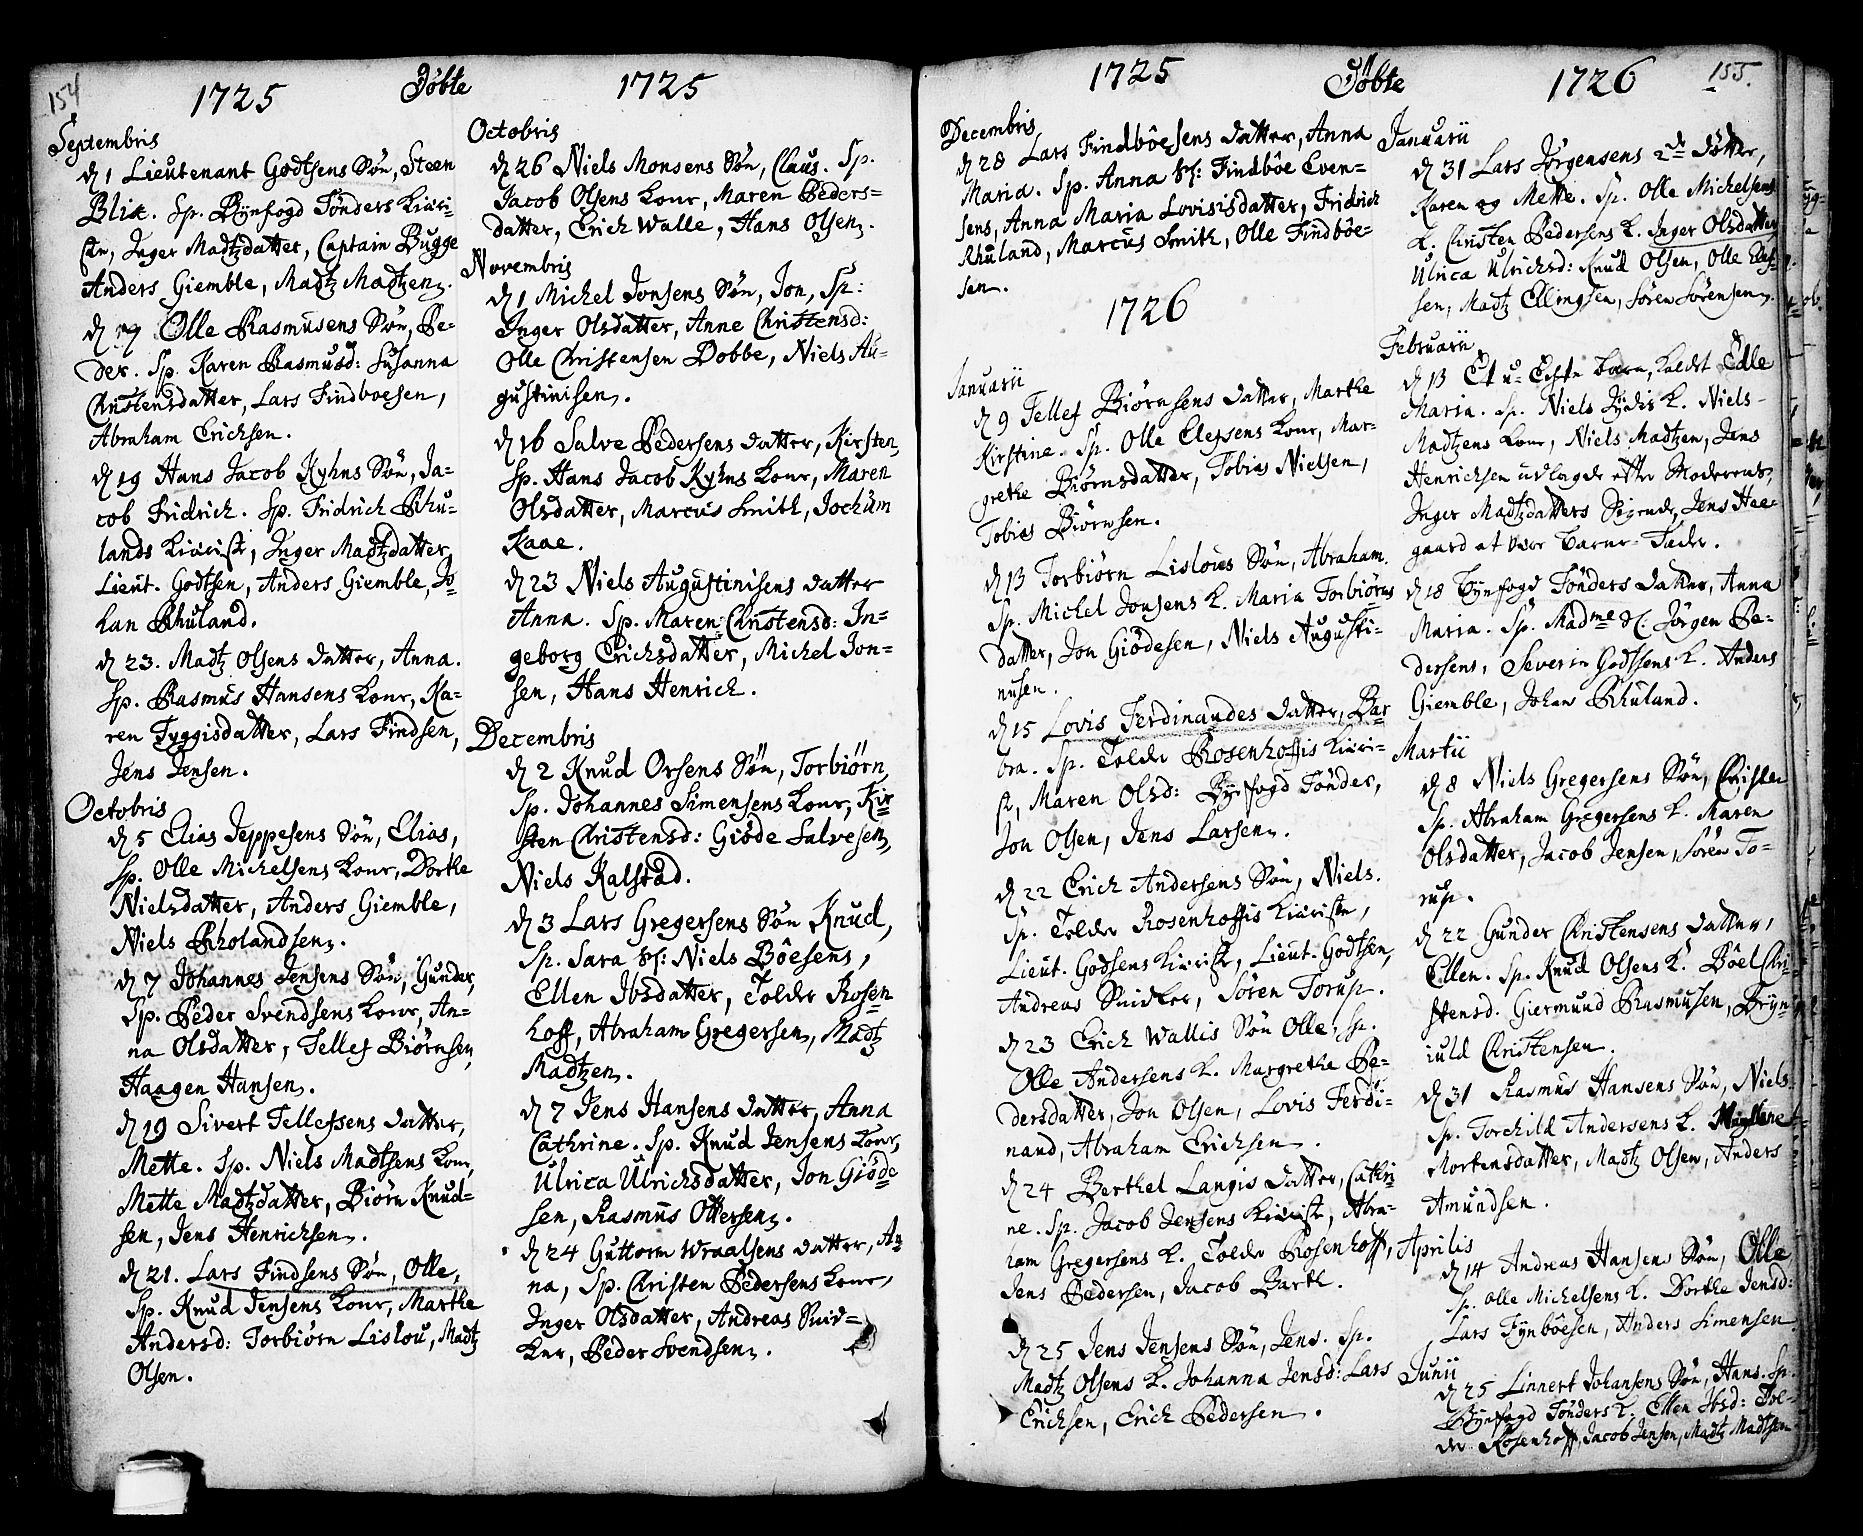 SAKO, Kragerø kirkebøker, F/Fa/L0001: Ministerialbok nr. 1, 1702-1766, s. 154-155